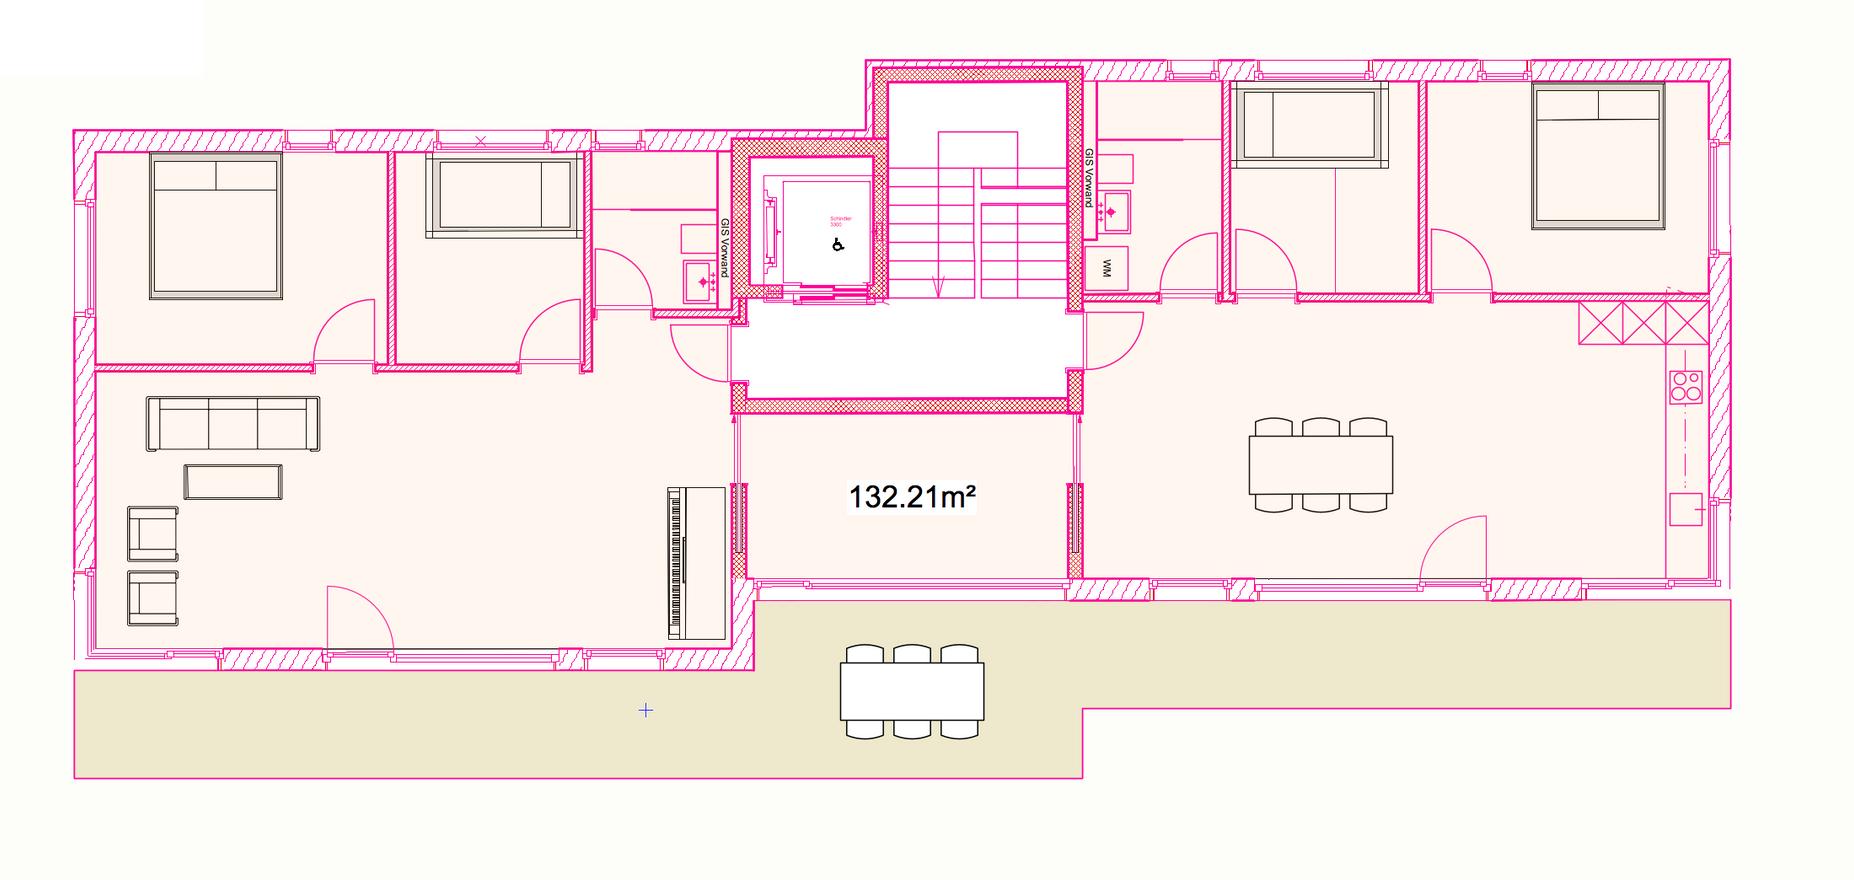 Mehrfamilienhaus Geschosswohung über ganze Etage